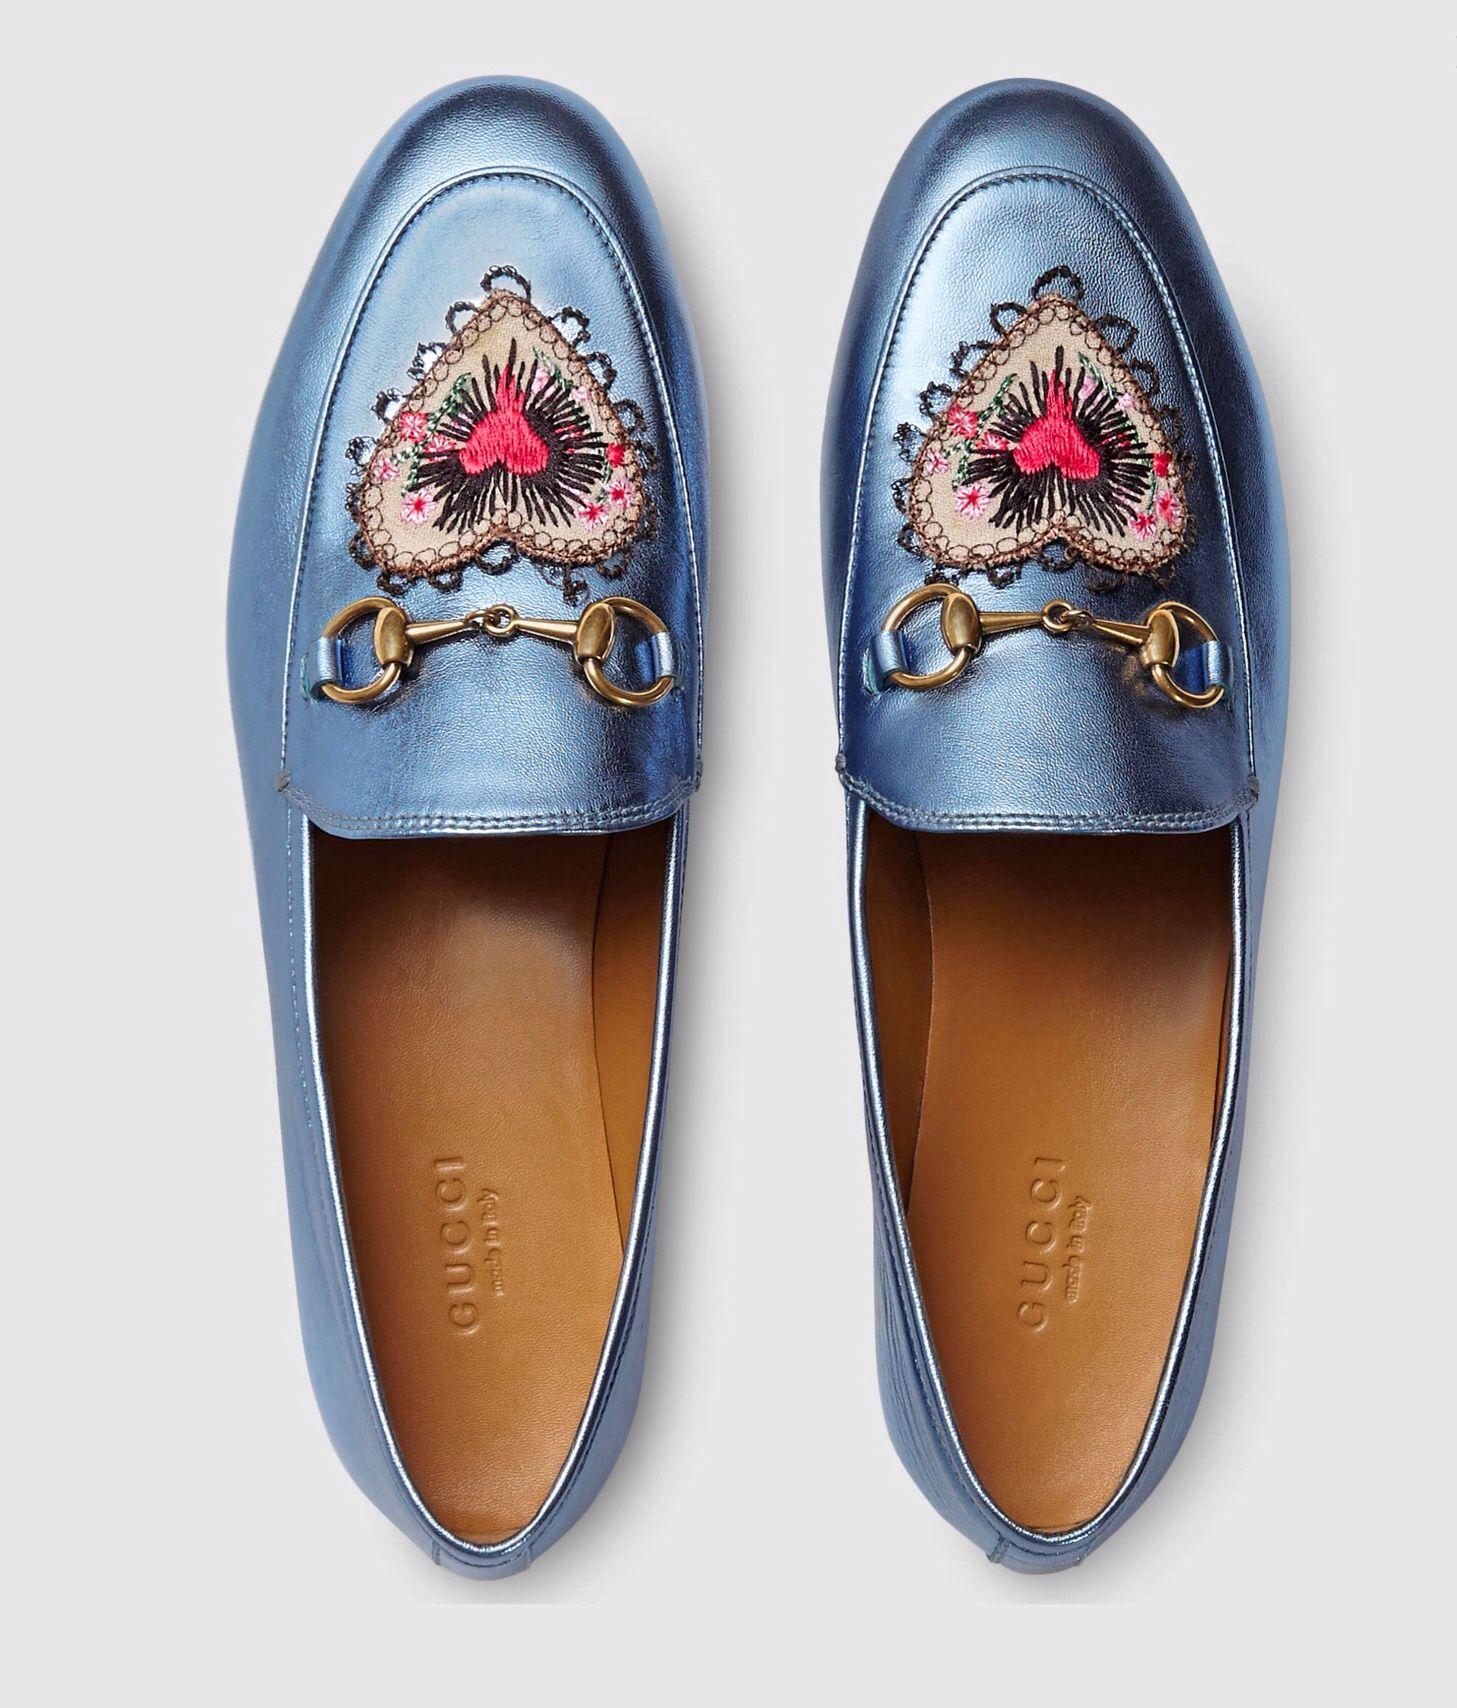 ab48ee6113b Something blue babe Metallic Loafers